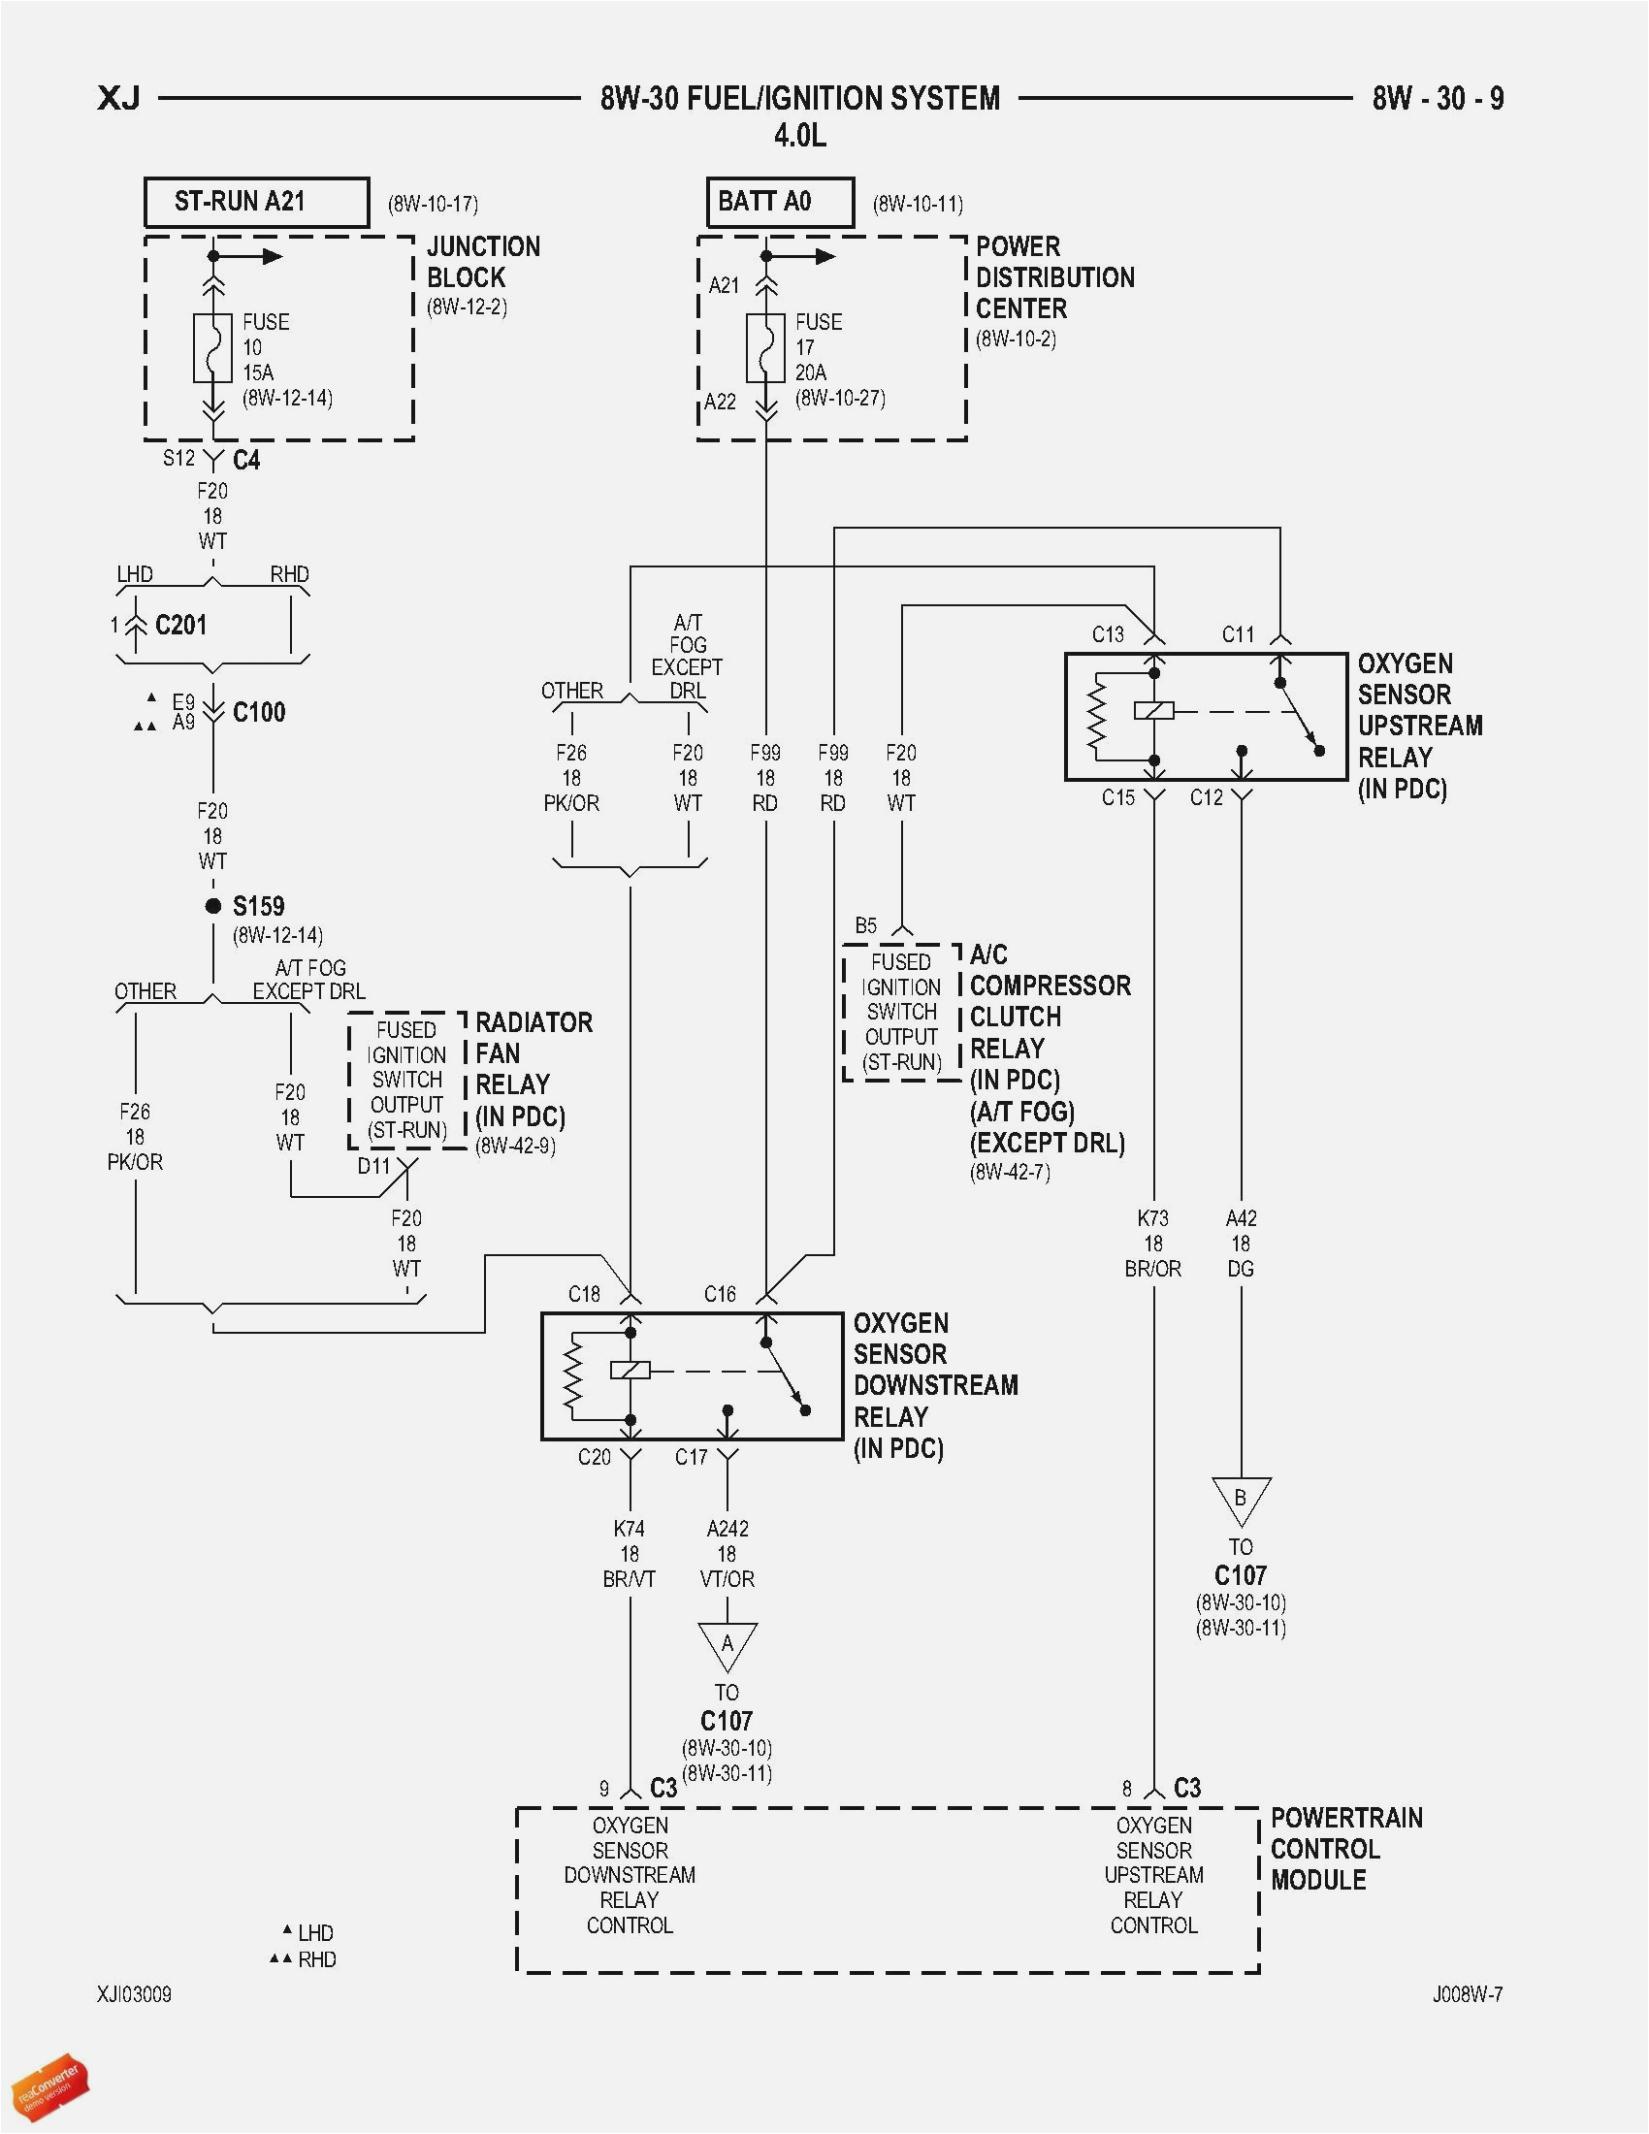 saturn ion o2 sensor wiring diagram advance wiring diagram saturn ion o2 sensor wiring diagram